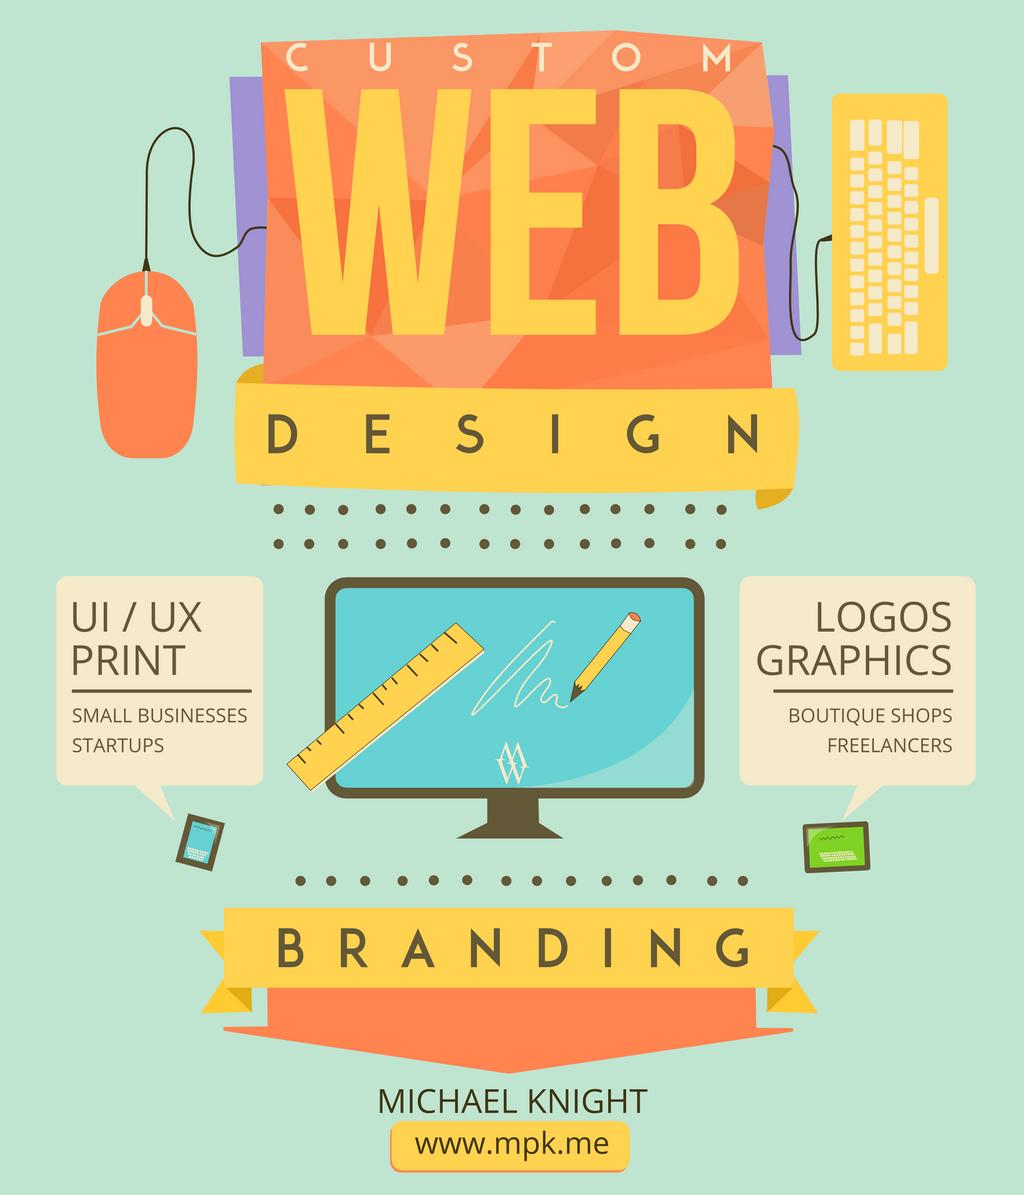 Web Design and Branding Flyer by KnightRider71 on DeviantArt